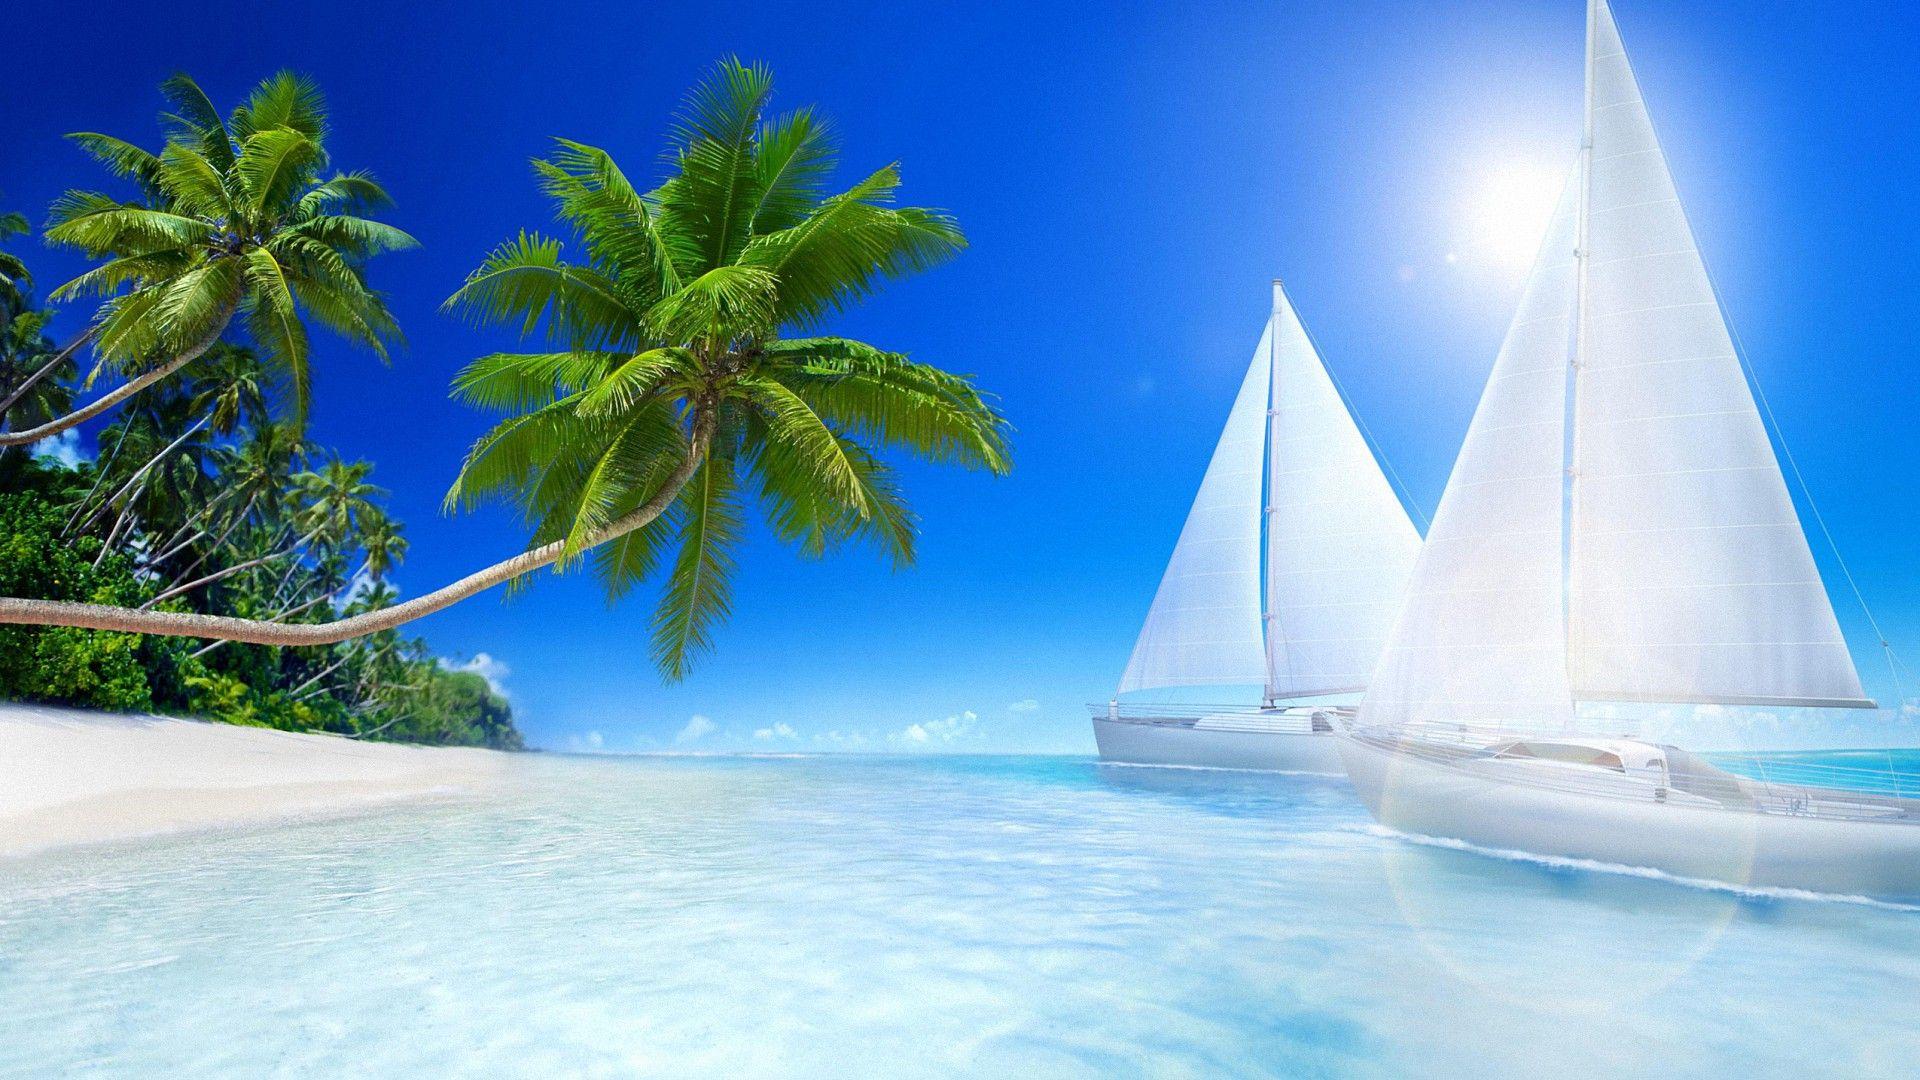 Hd wallpaper beach - Awesome Tropical Beach Hd Wallpapers